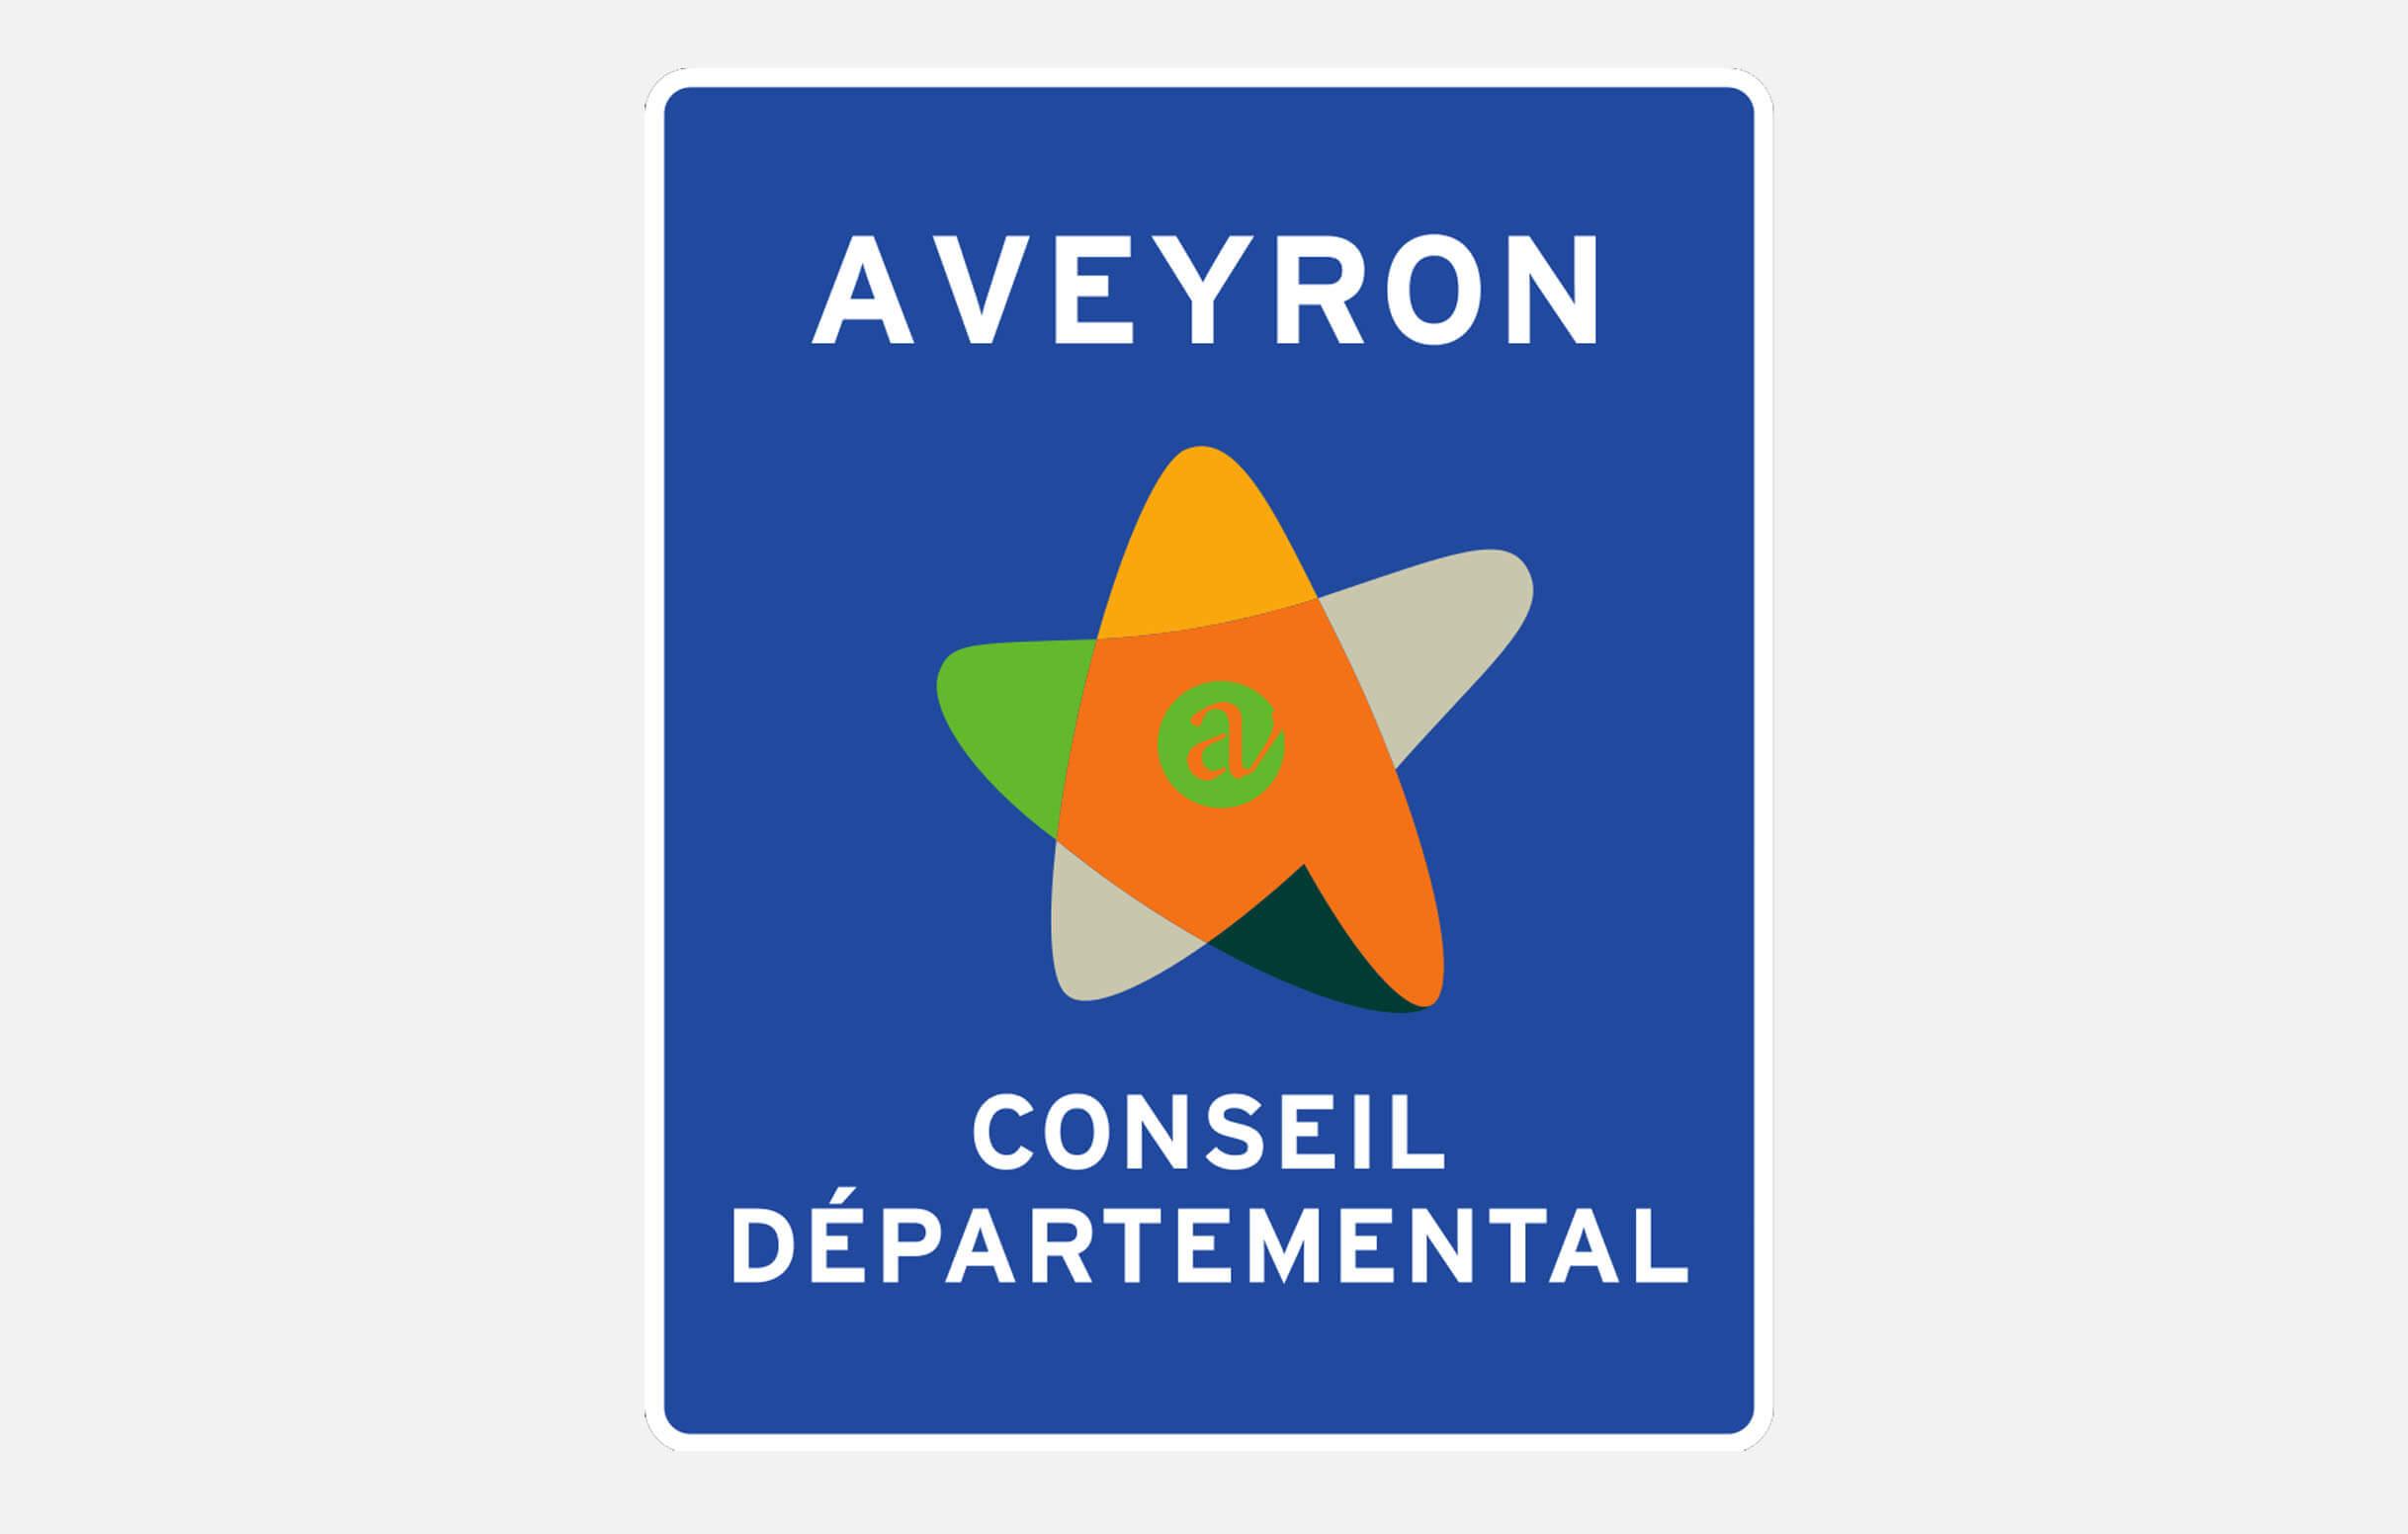 aveyron-conseil-departemental